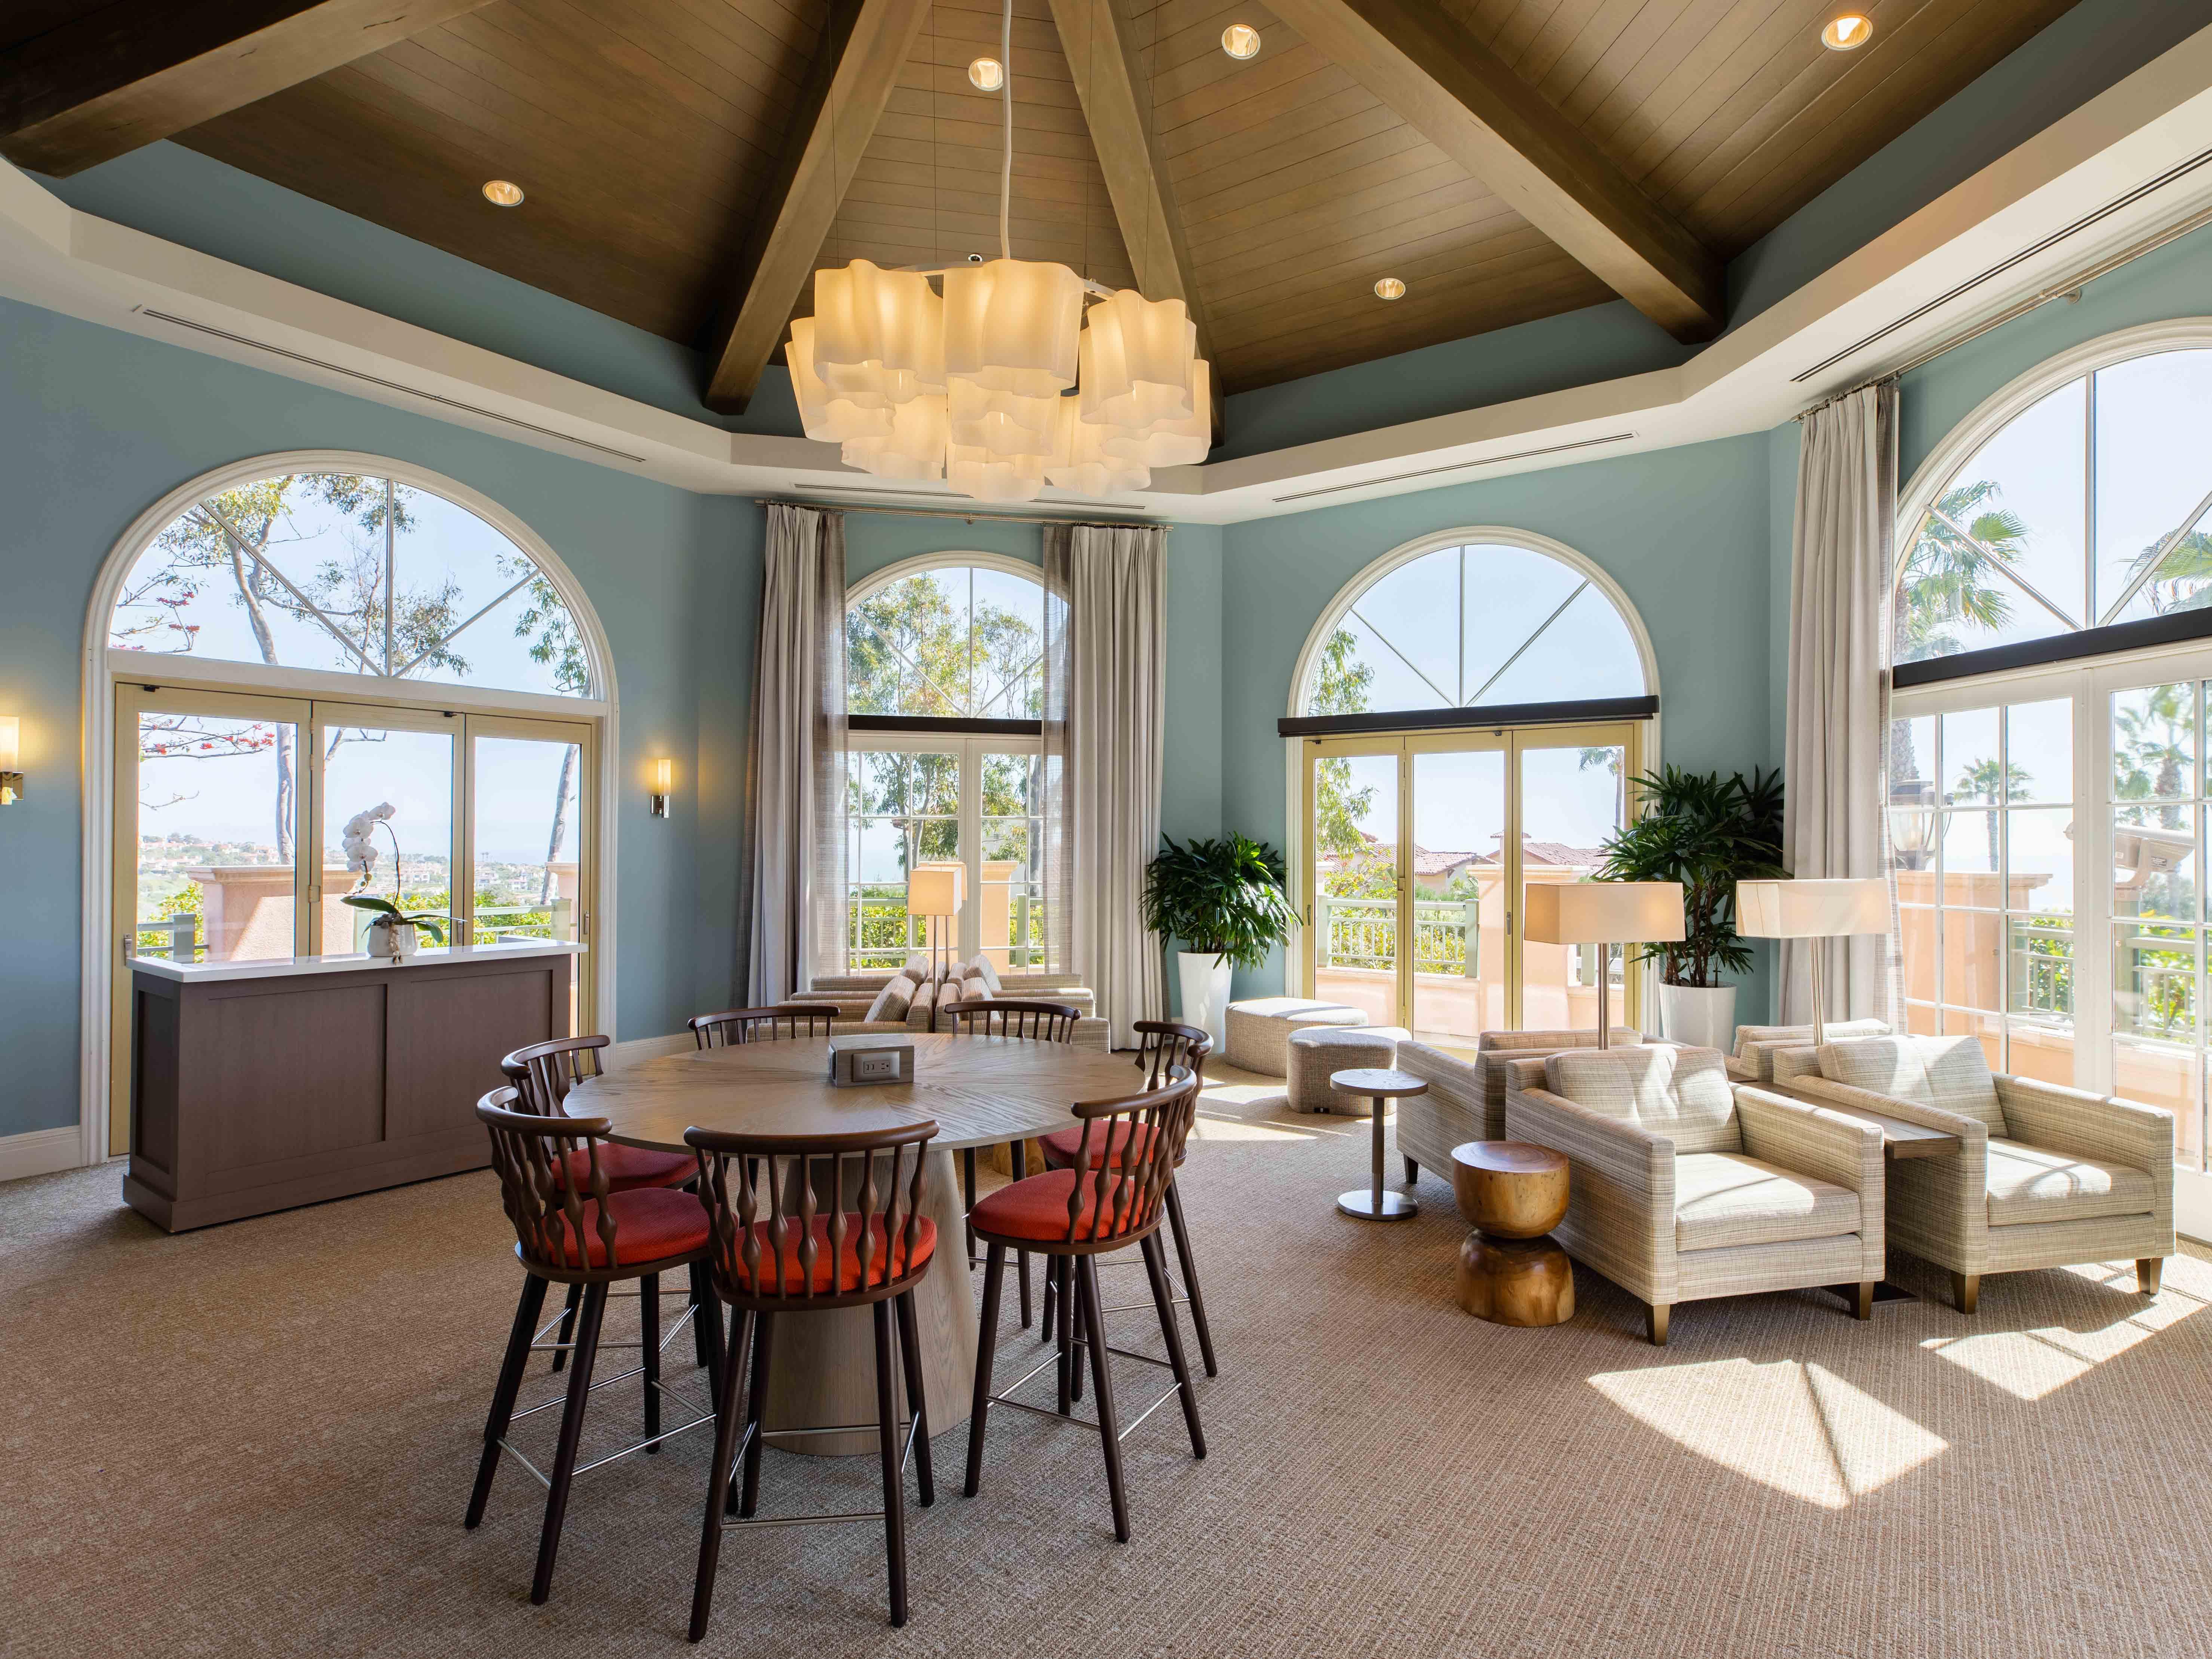 Marriott's Newport Coast<span class='trademark'>®</span> Villas Owners' Lounge. Marriott's Newport Coast<span class='trademark'>®</span> Villas is located in Newport Coast, California United States.